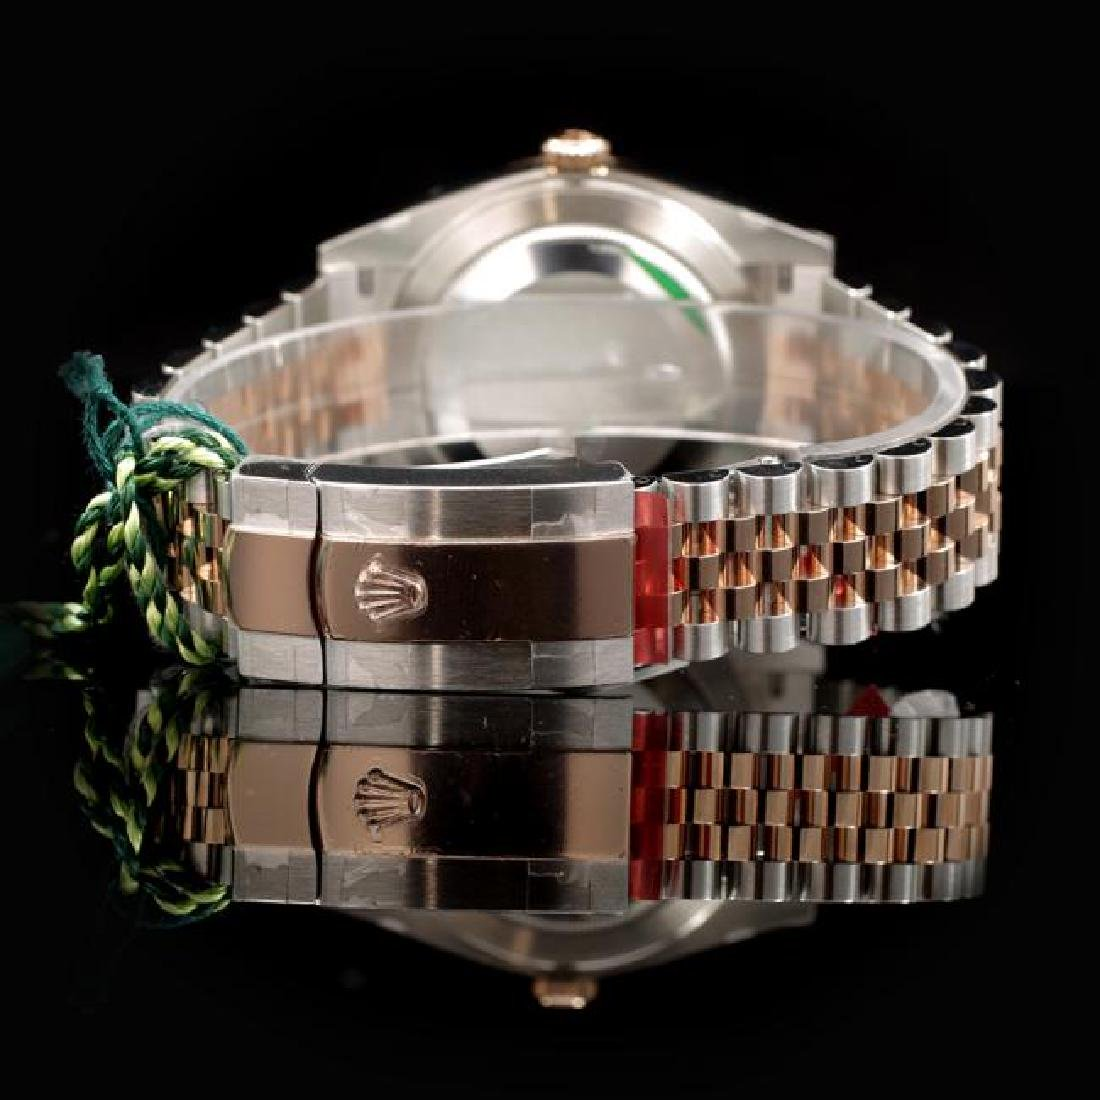 Rolex DateJust Two-Tone 41mm Men's Wristwatch - 3